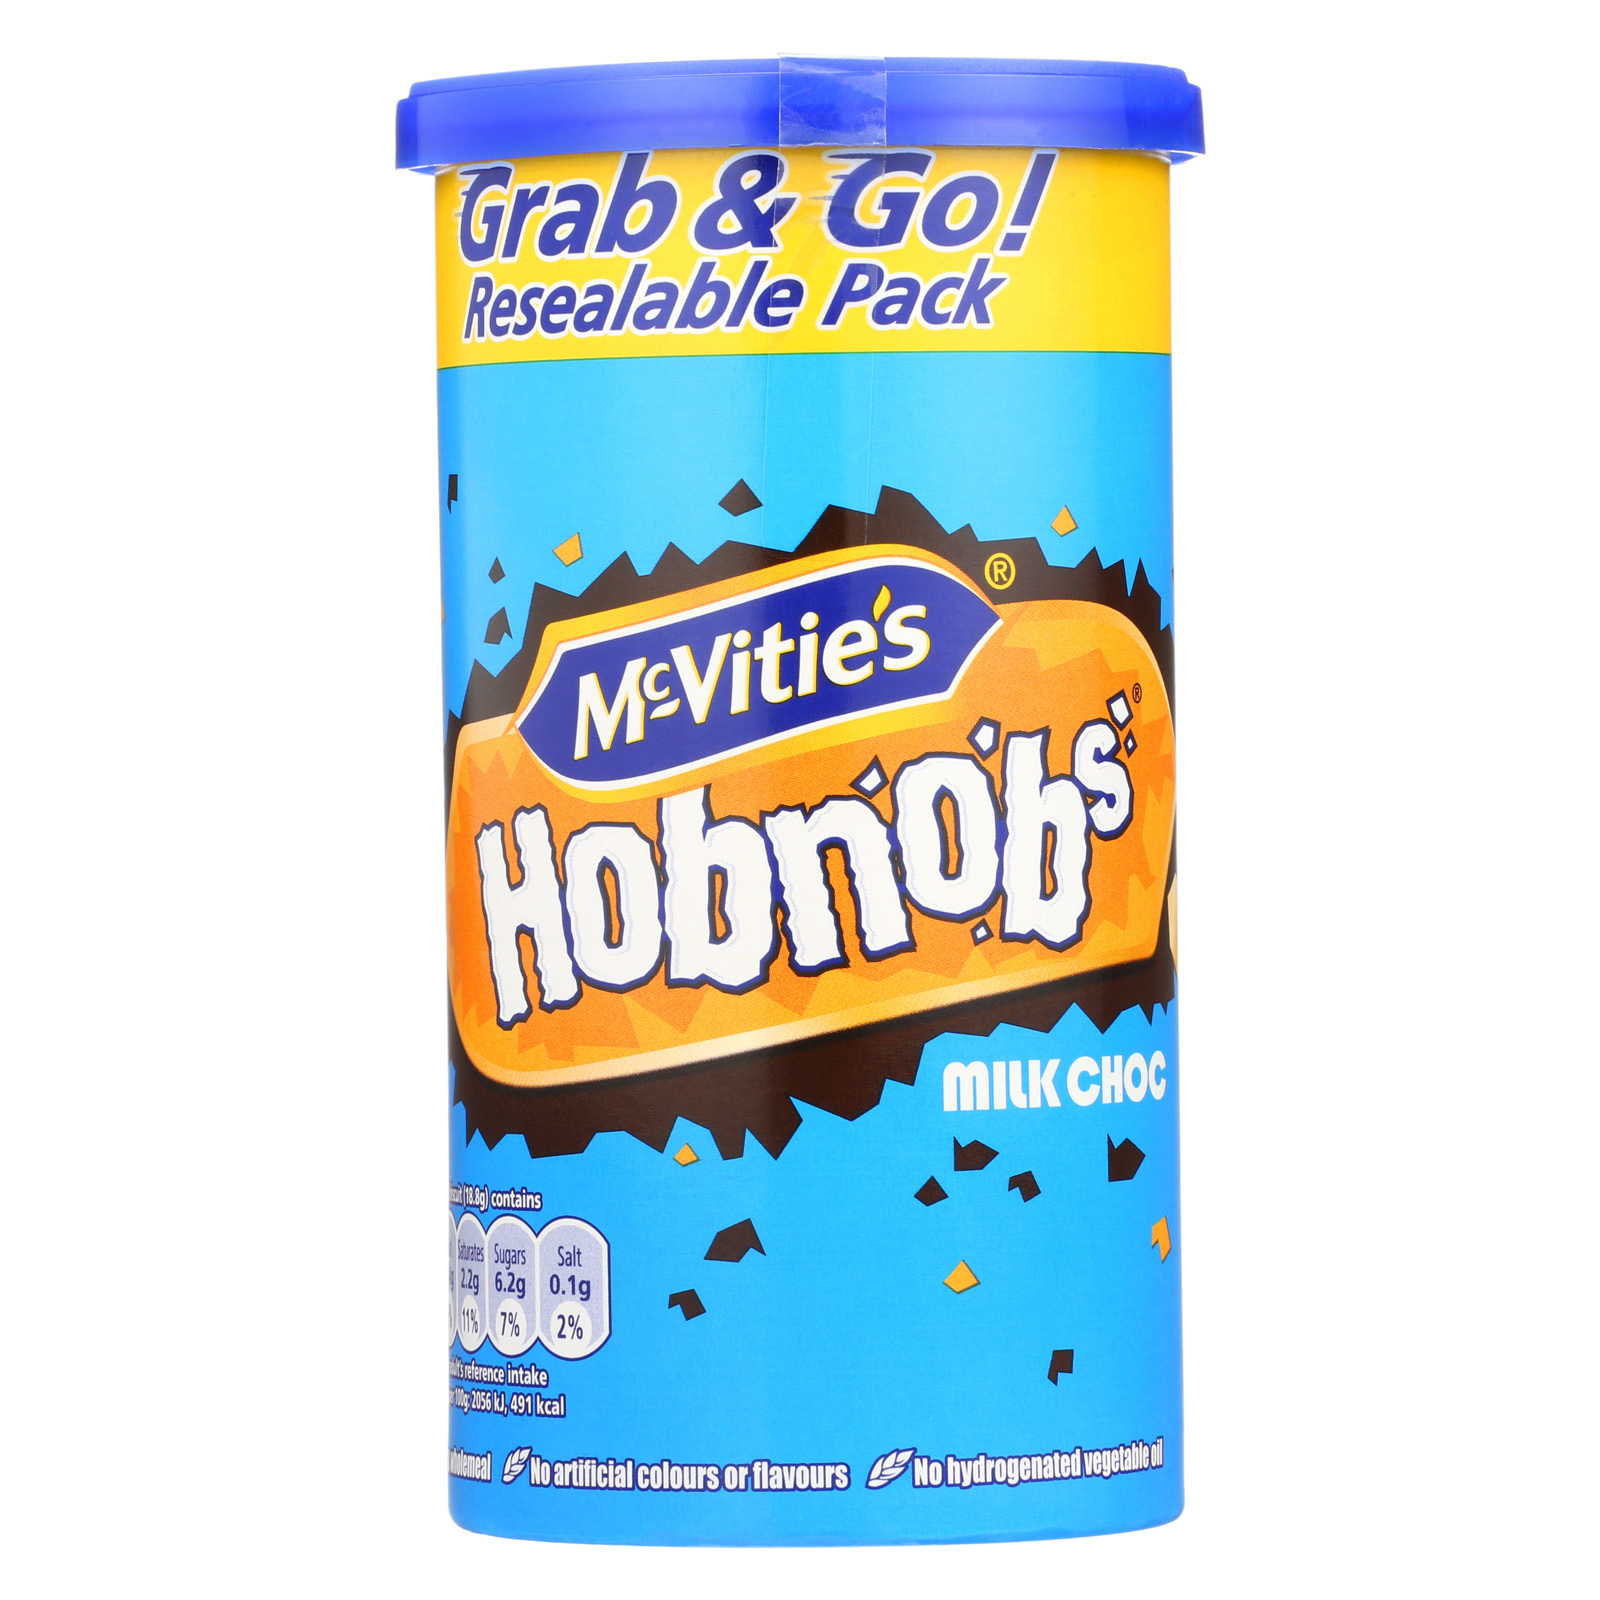 Mcvities Hobnobs - Milk Chocolate - Case of 12 - 7.2 oz.